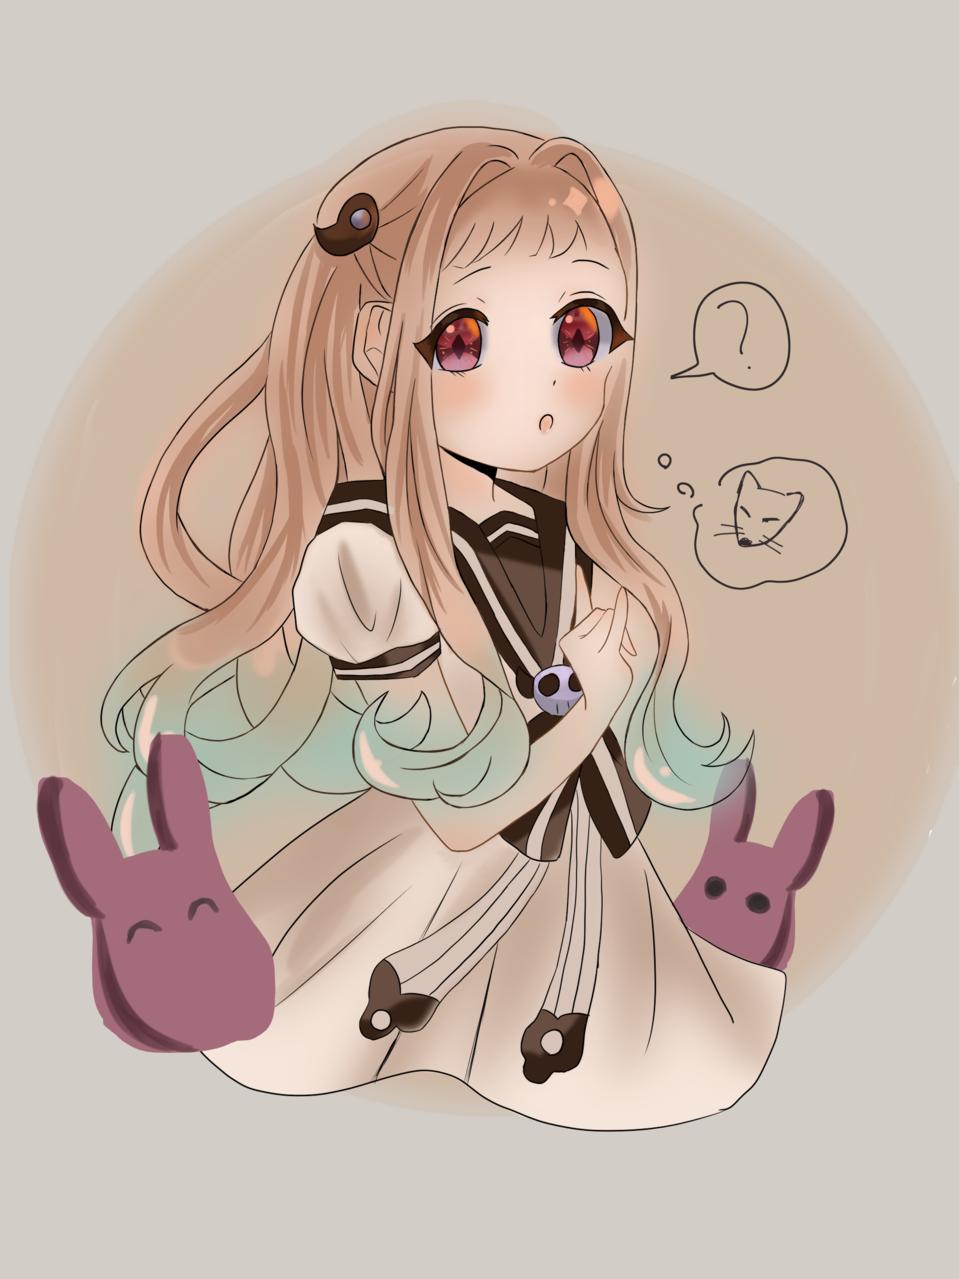 Illust of 茶茶 NeneYashiro 物怪